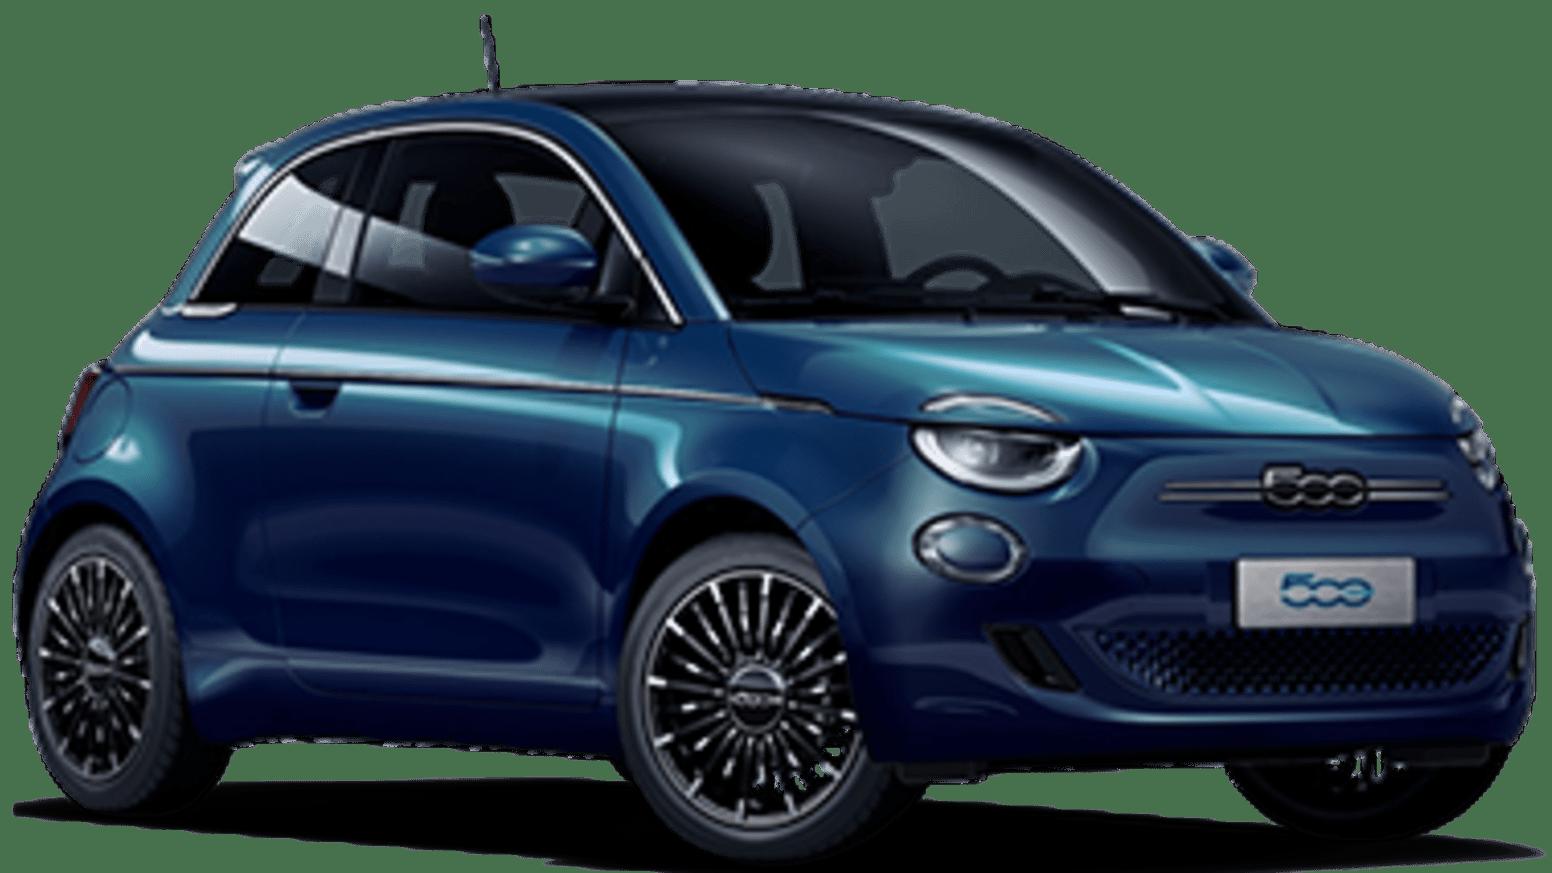 Fiat 500 Electric Hatchback